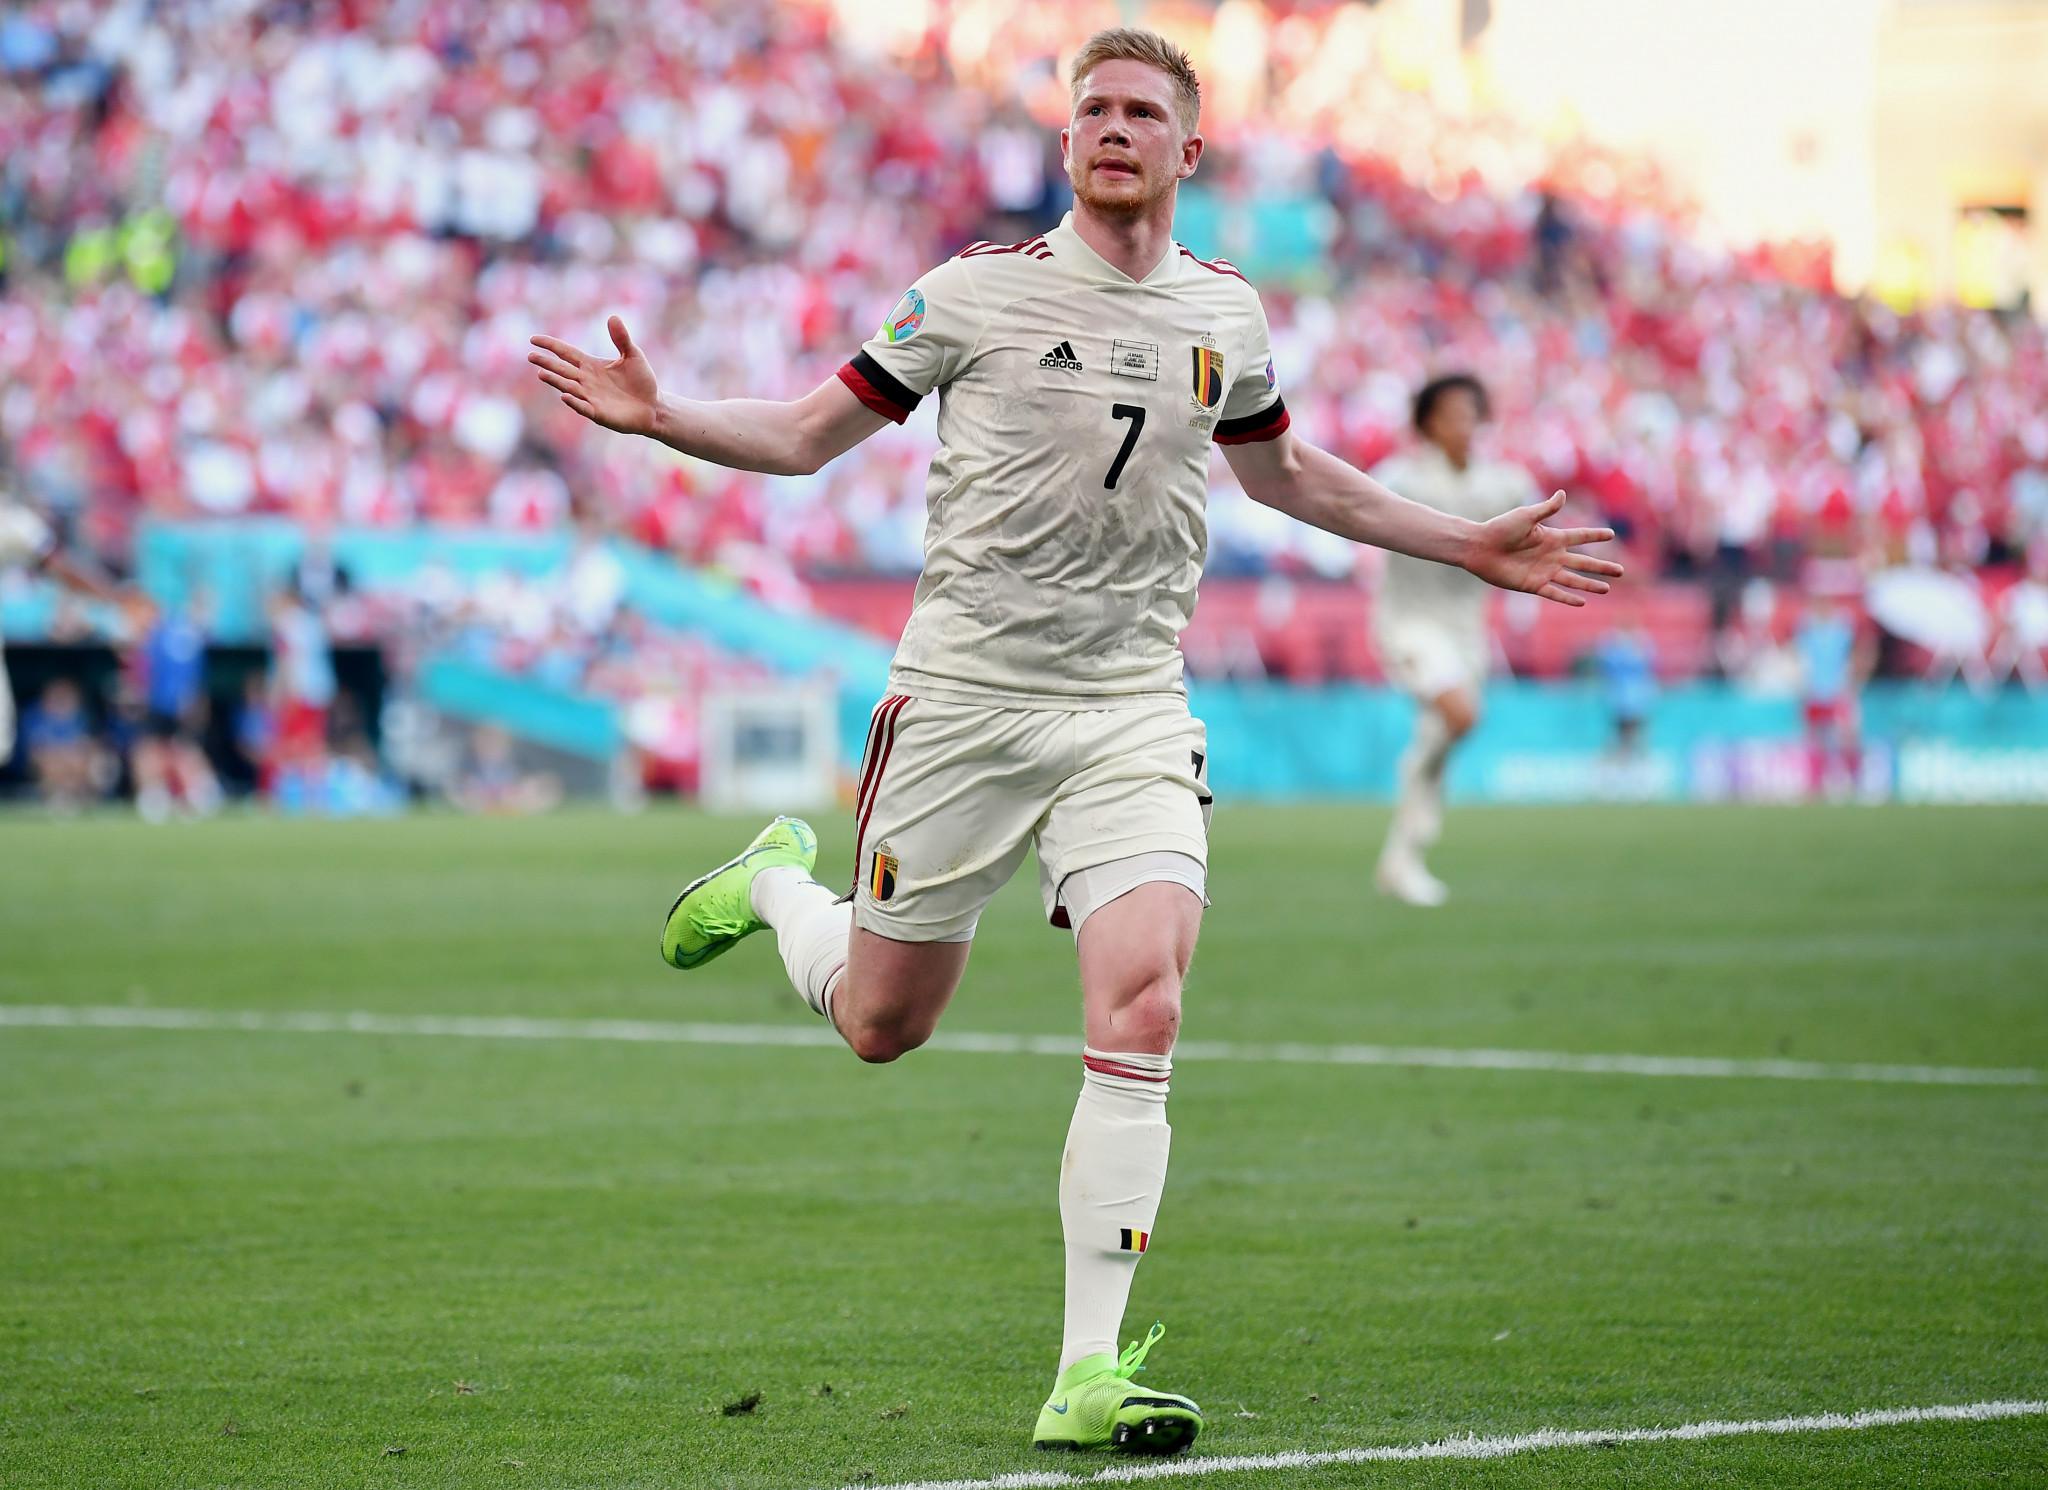 Belgium through to Euro 2020 last 16 after comeback win over Denmark